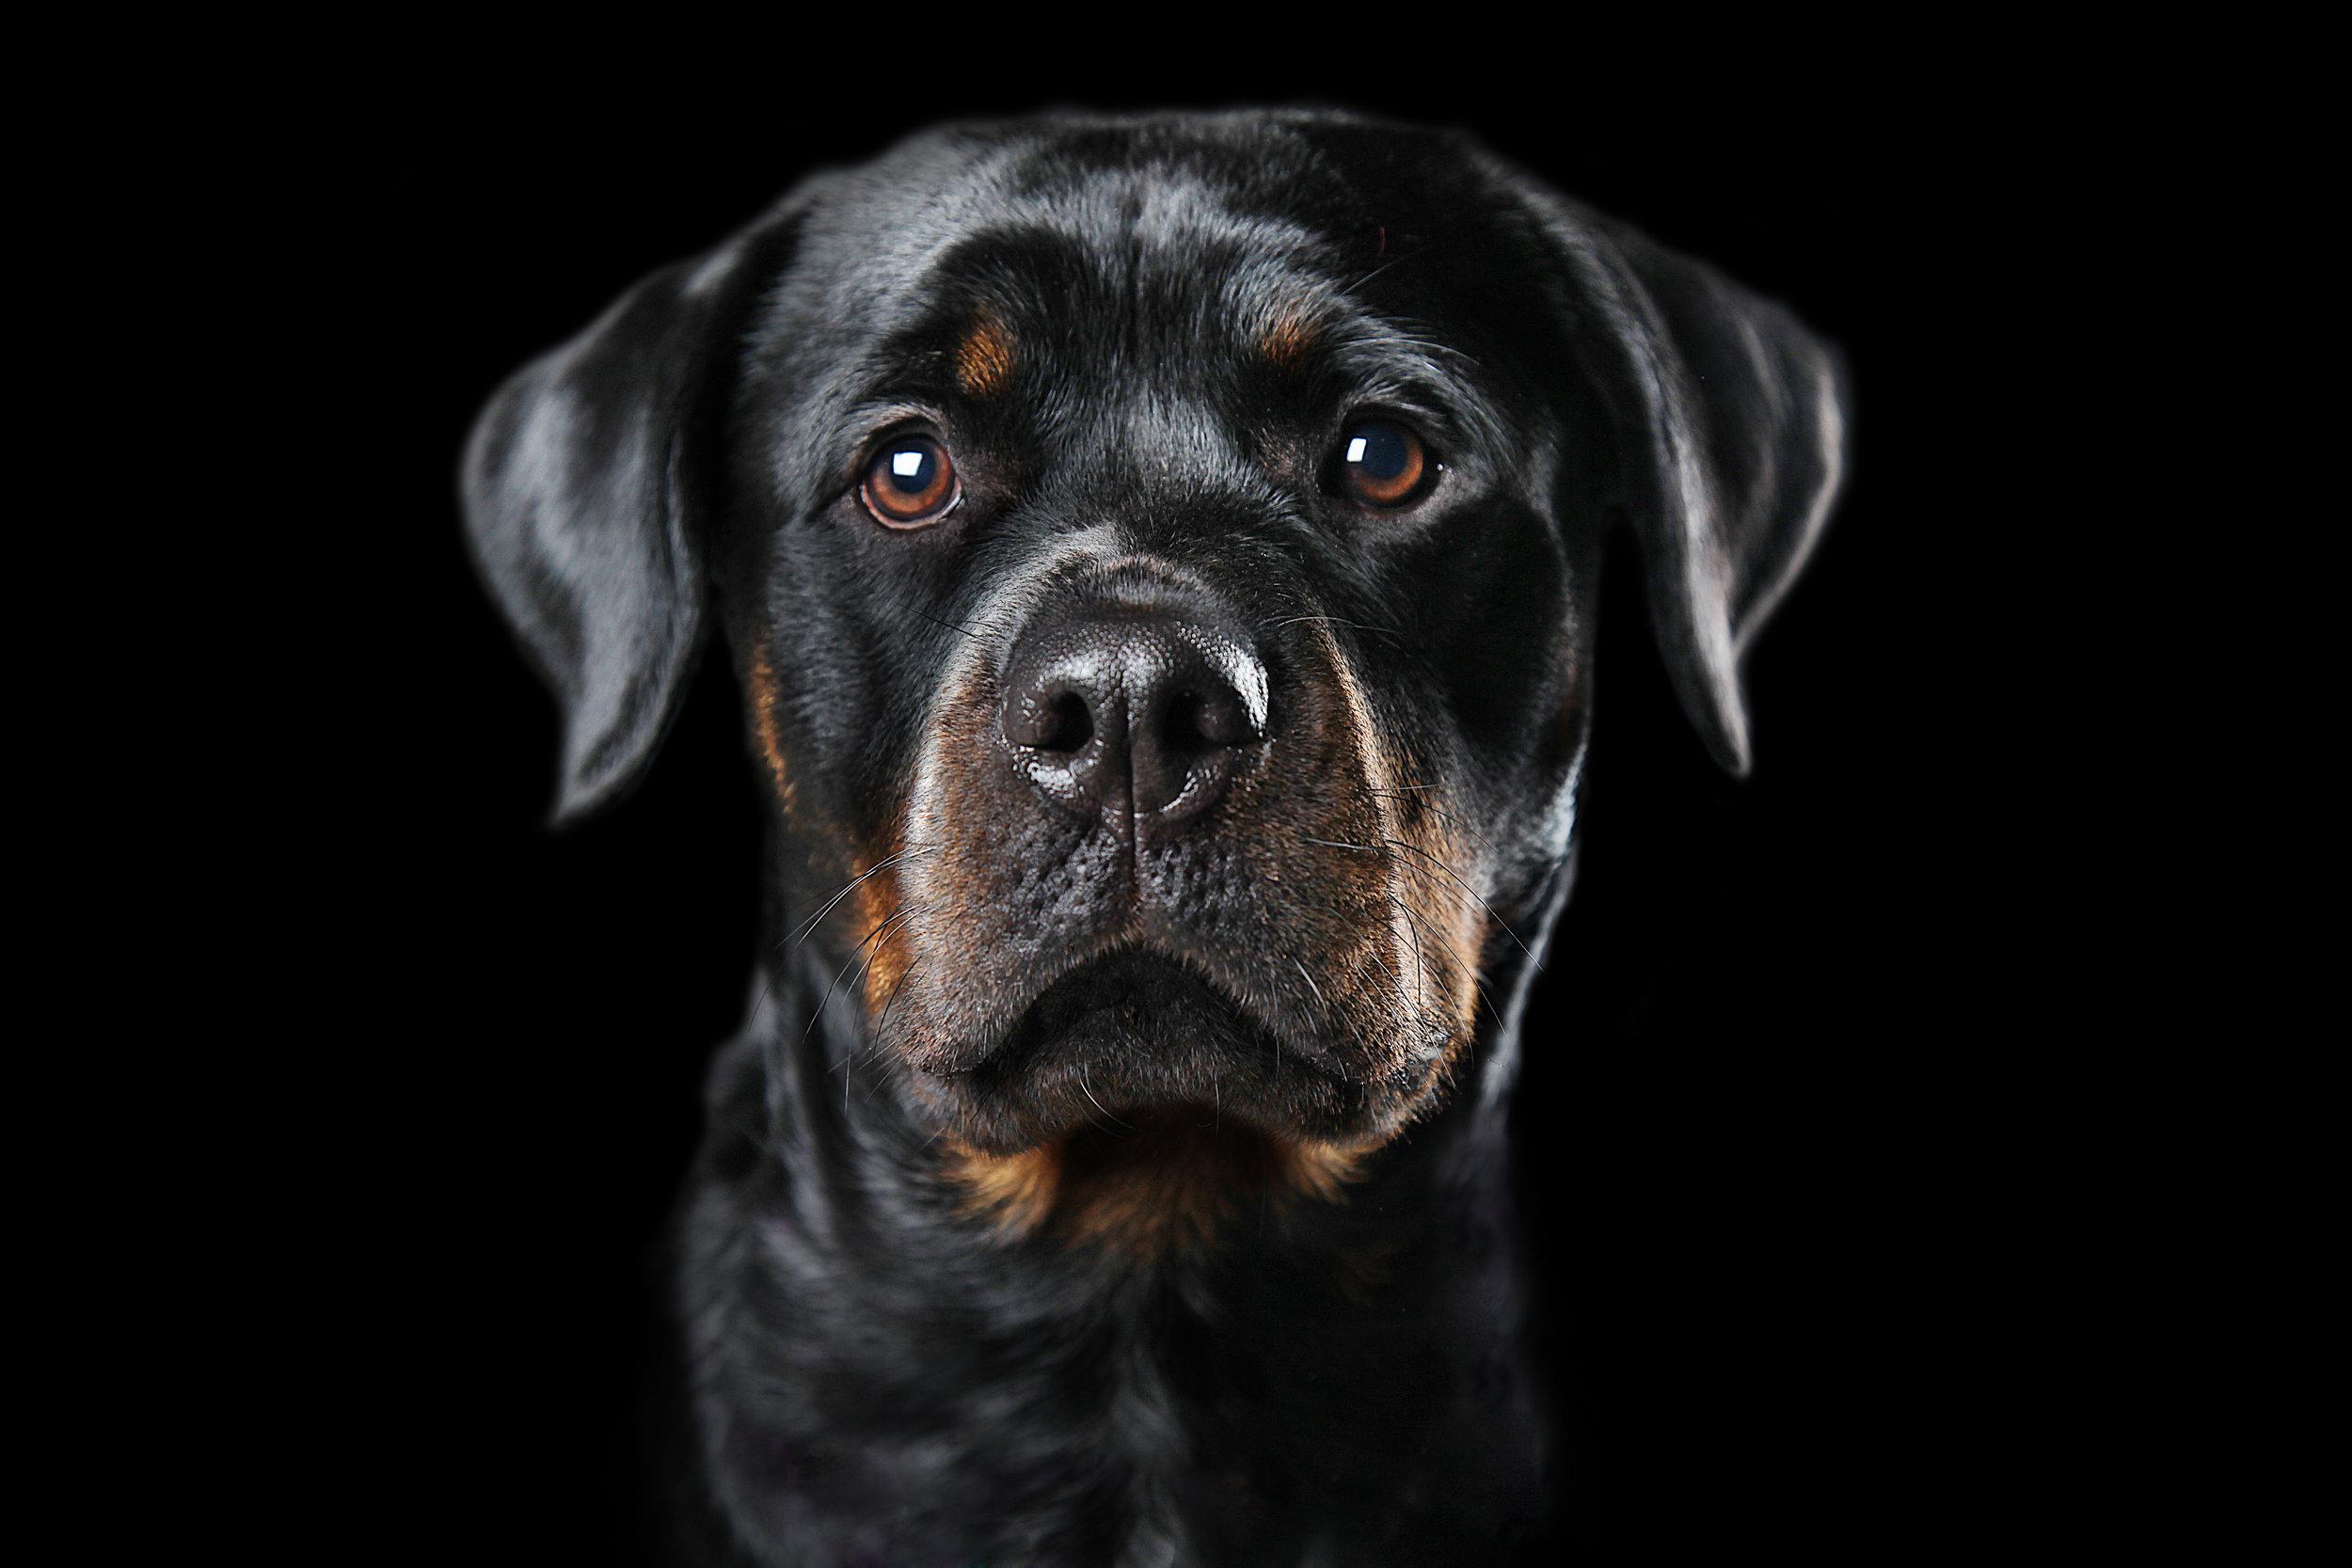 DOG ON BLACK BG RT copy 12.07.01 copy.jpg